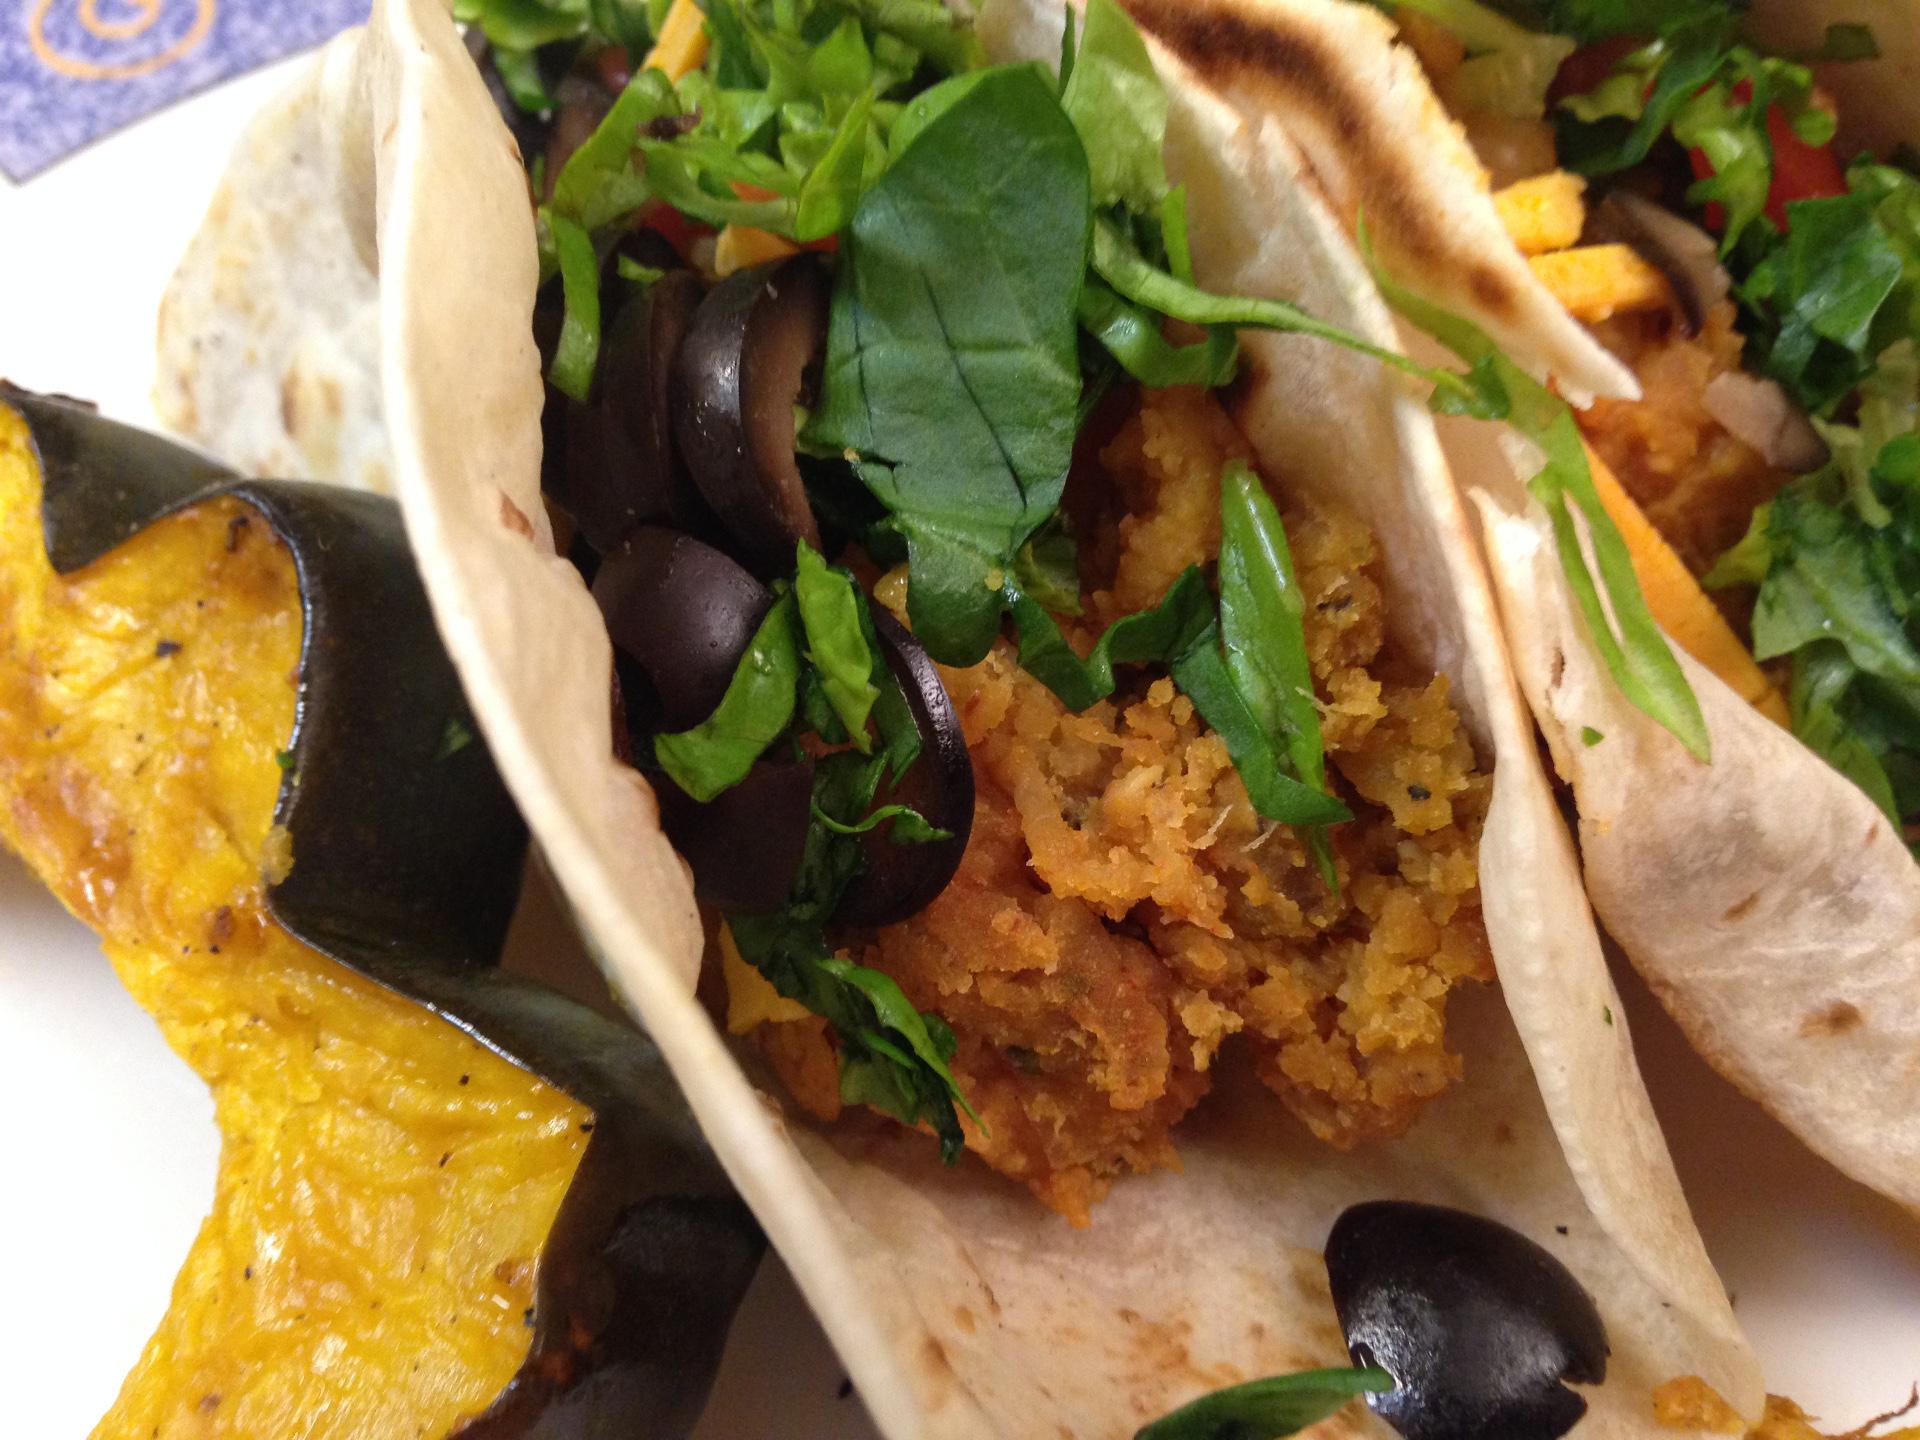 Southwestern Lentil Tacos by Chef Johnna Gale